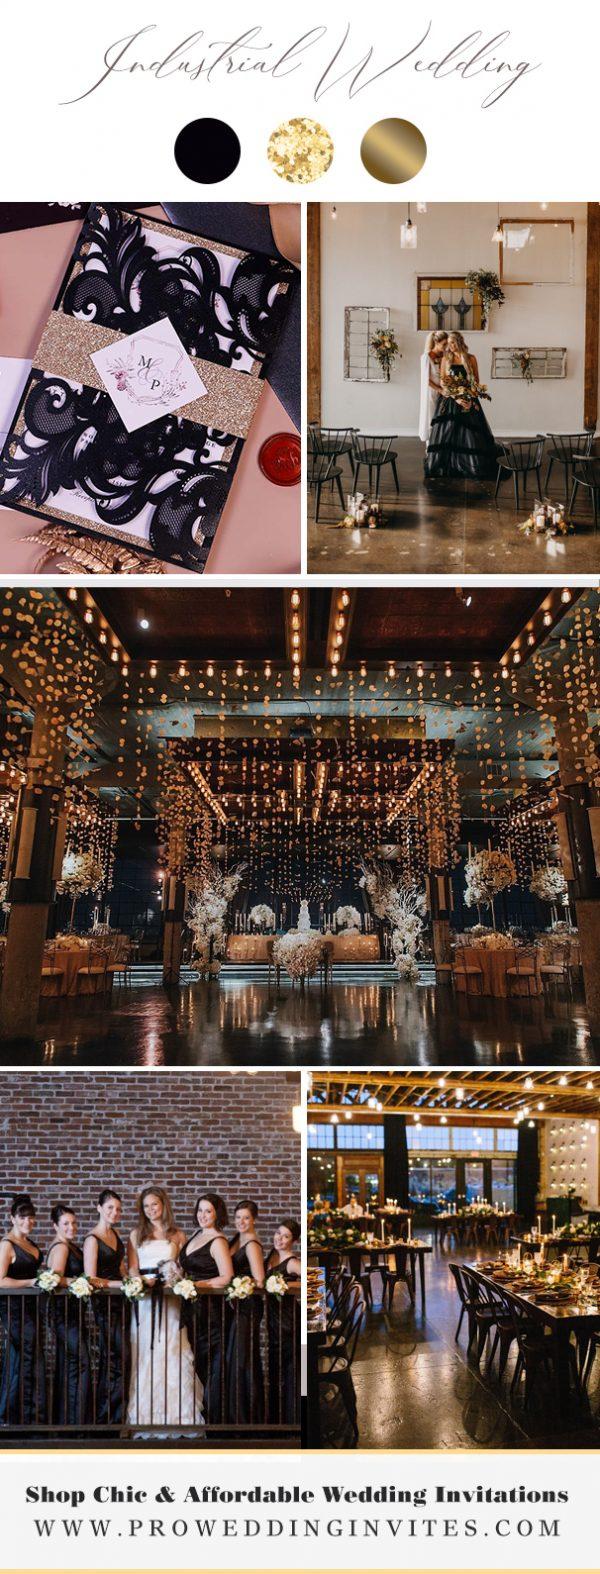 Metal & Copper Industrial Wedding Theme - Pro Wedding Invites